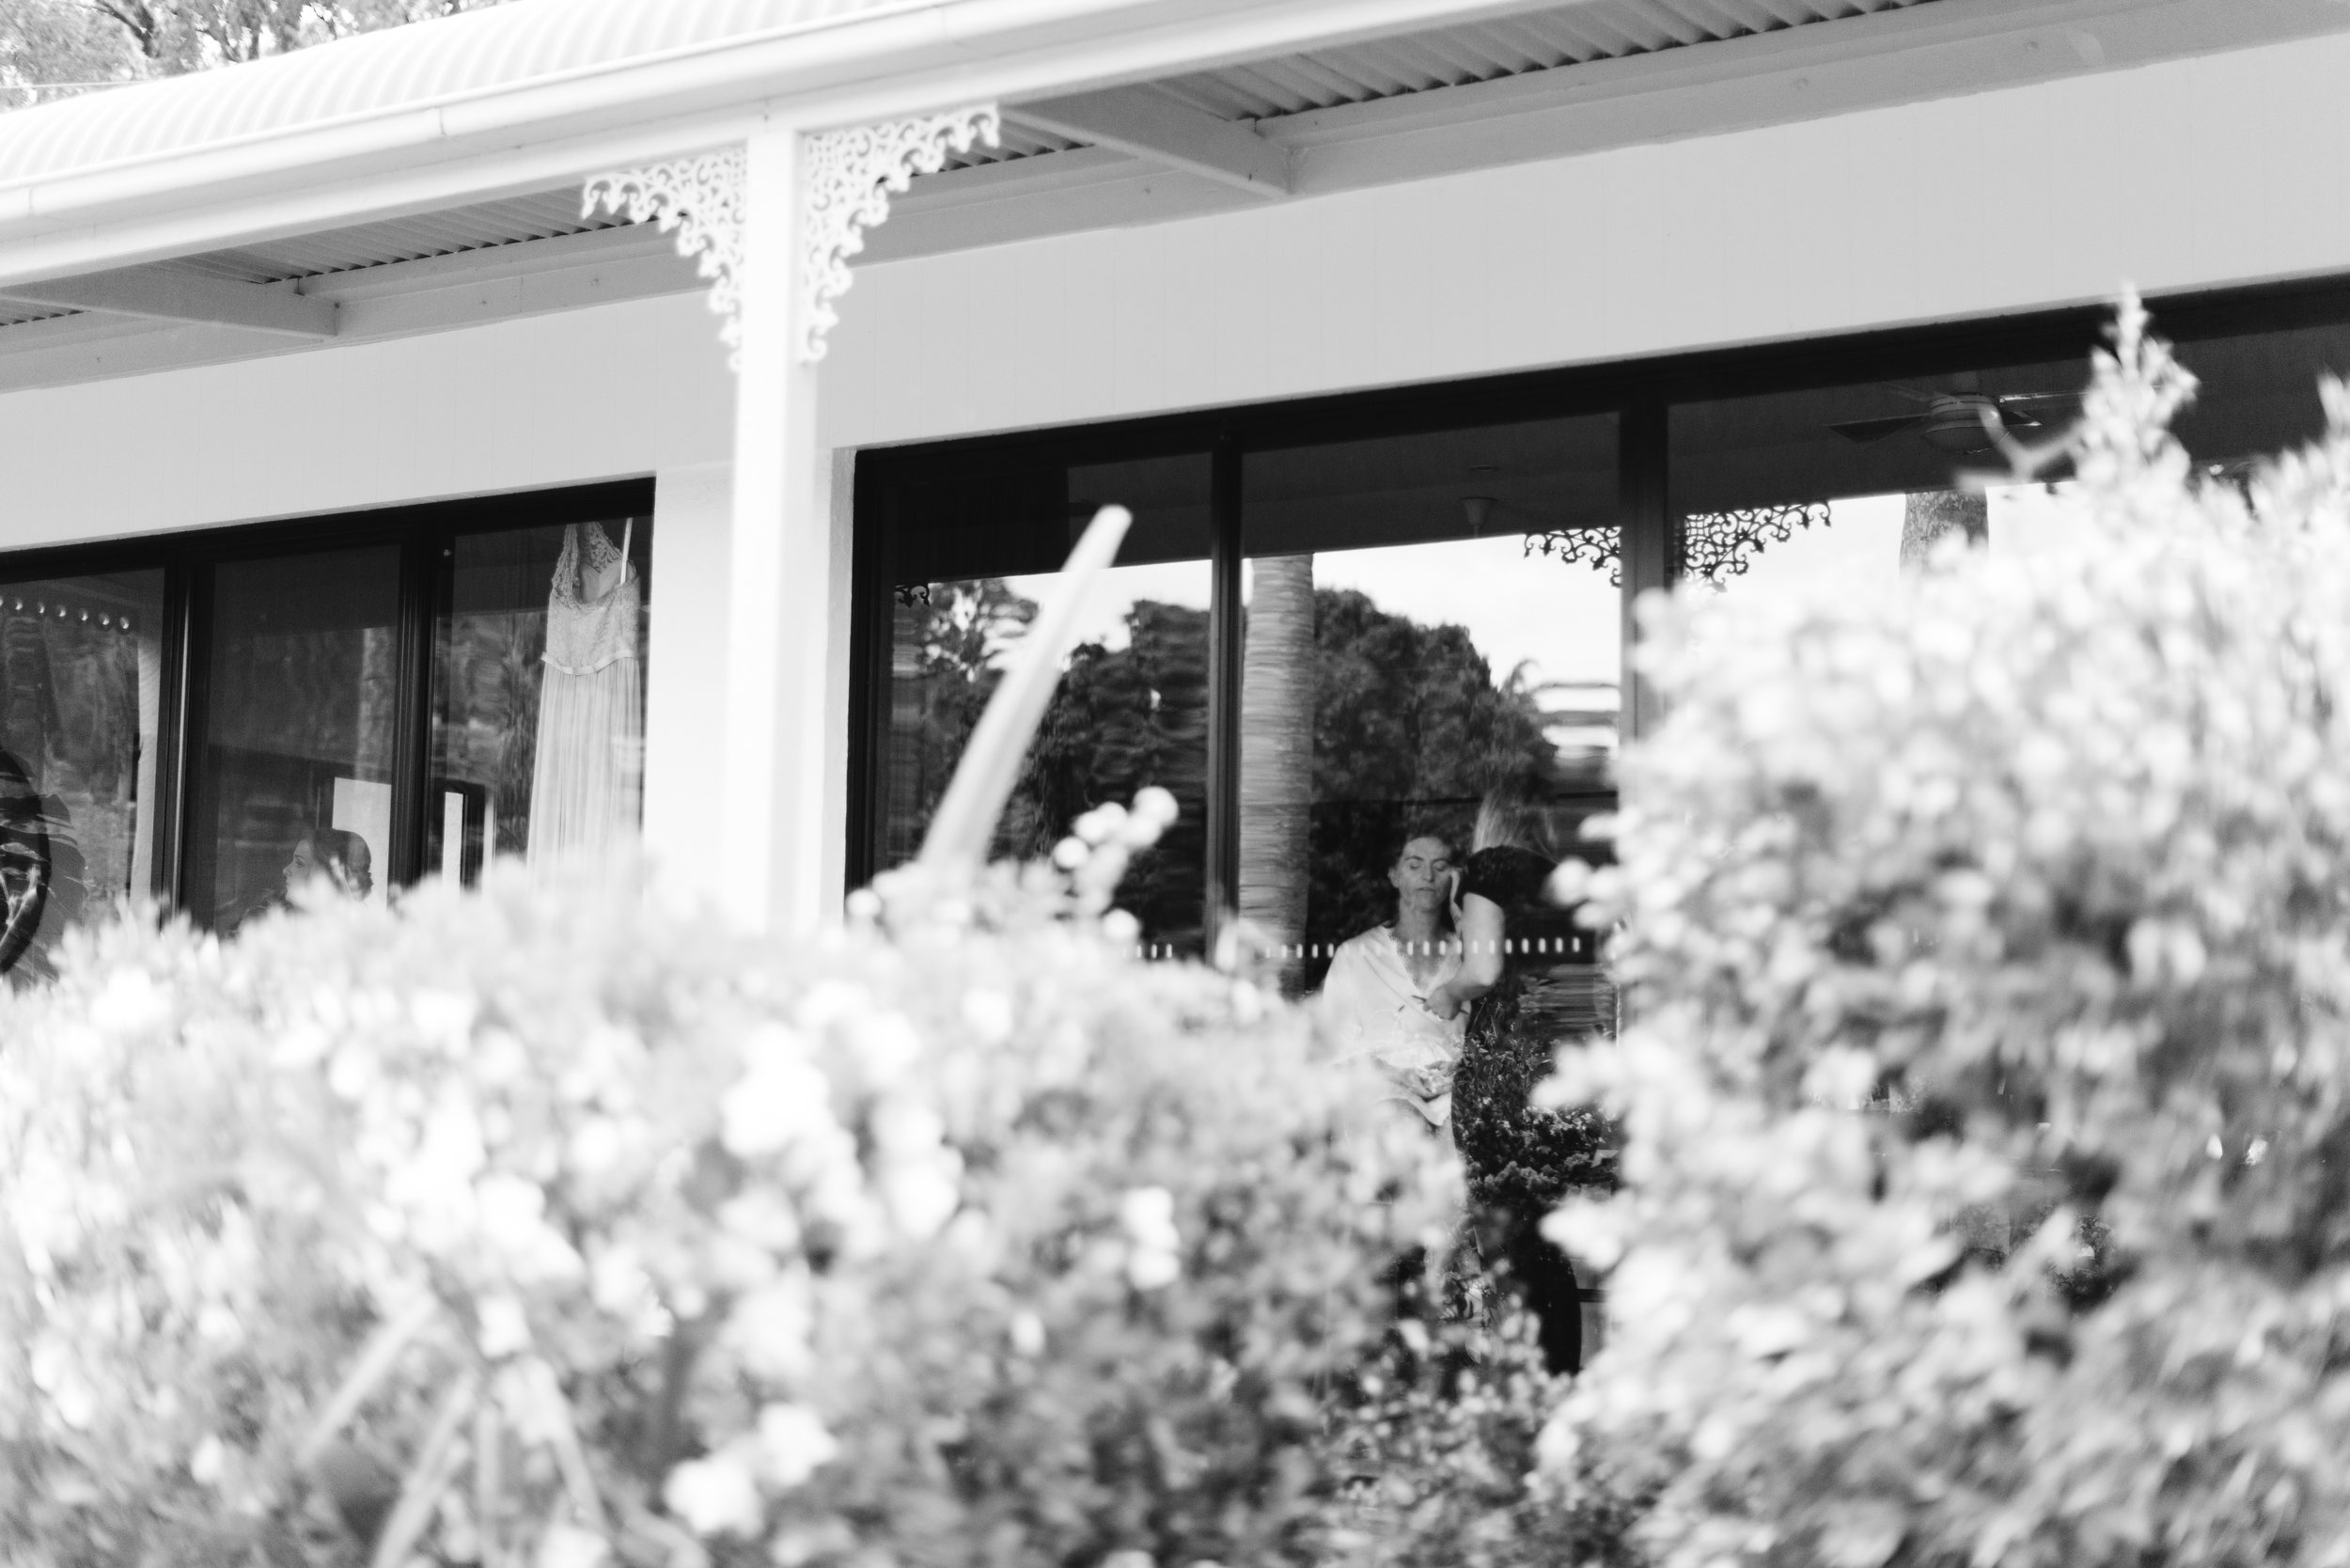 LAURENOLIVIA-austinvilla-estate-wedding-3.jpg